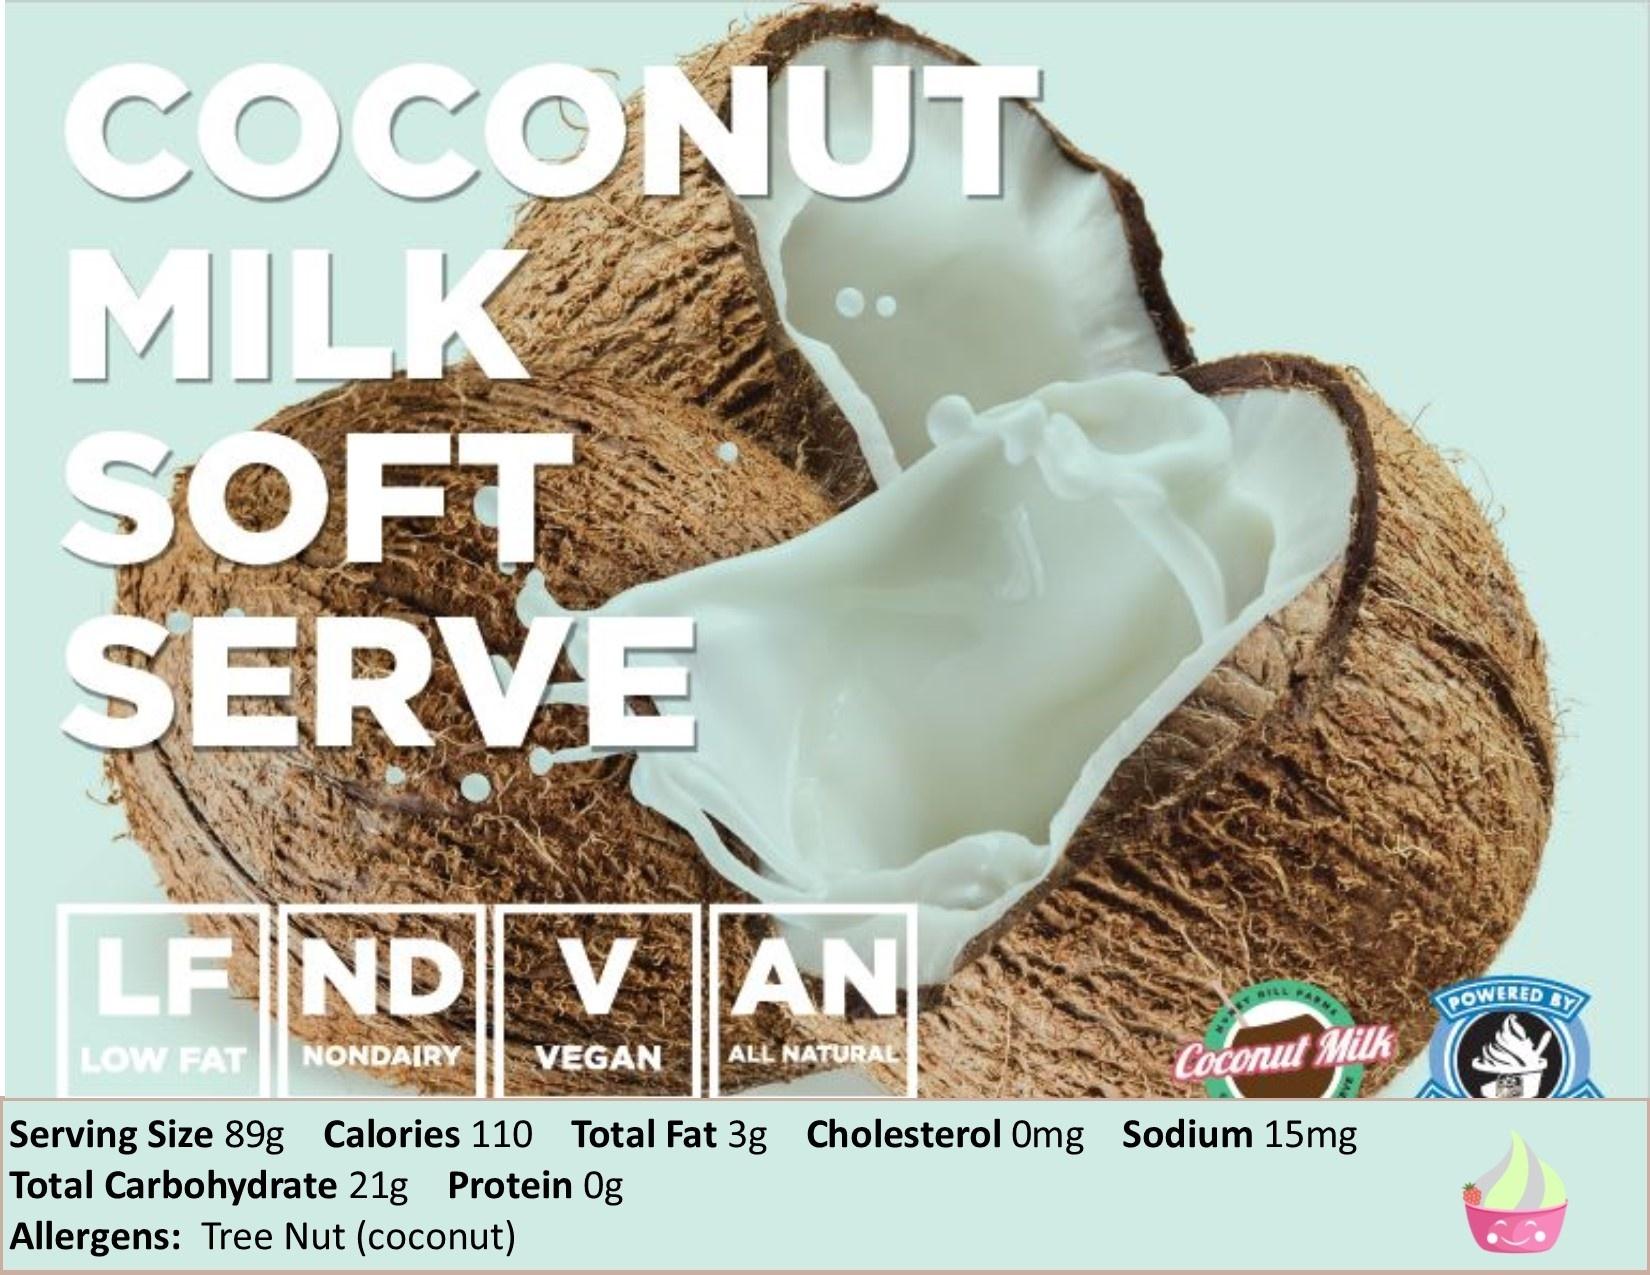 https://0201.nccdn.net/4_2/000/000/038/2d3/Coconut-Milk-Soft-Serve-LF-1650x1275-1650x1275.jpg